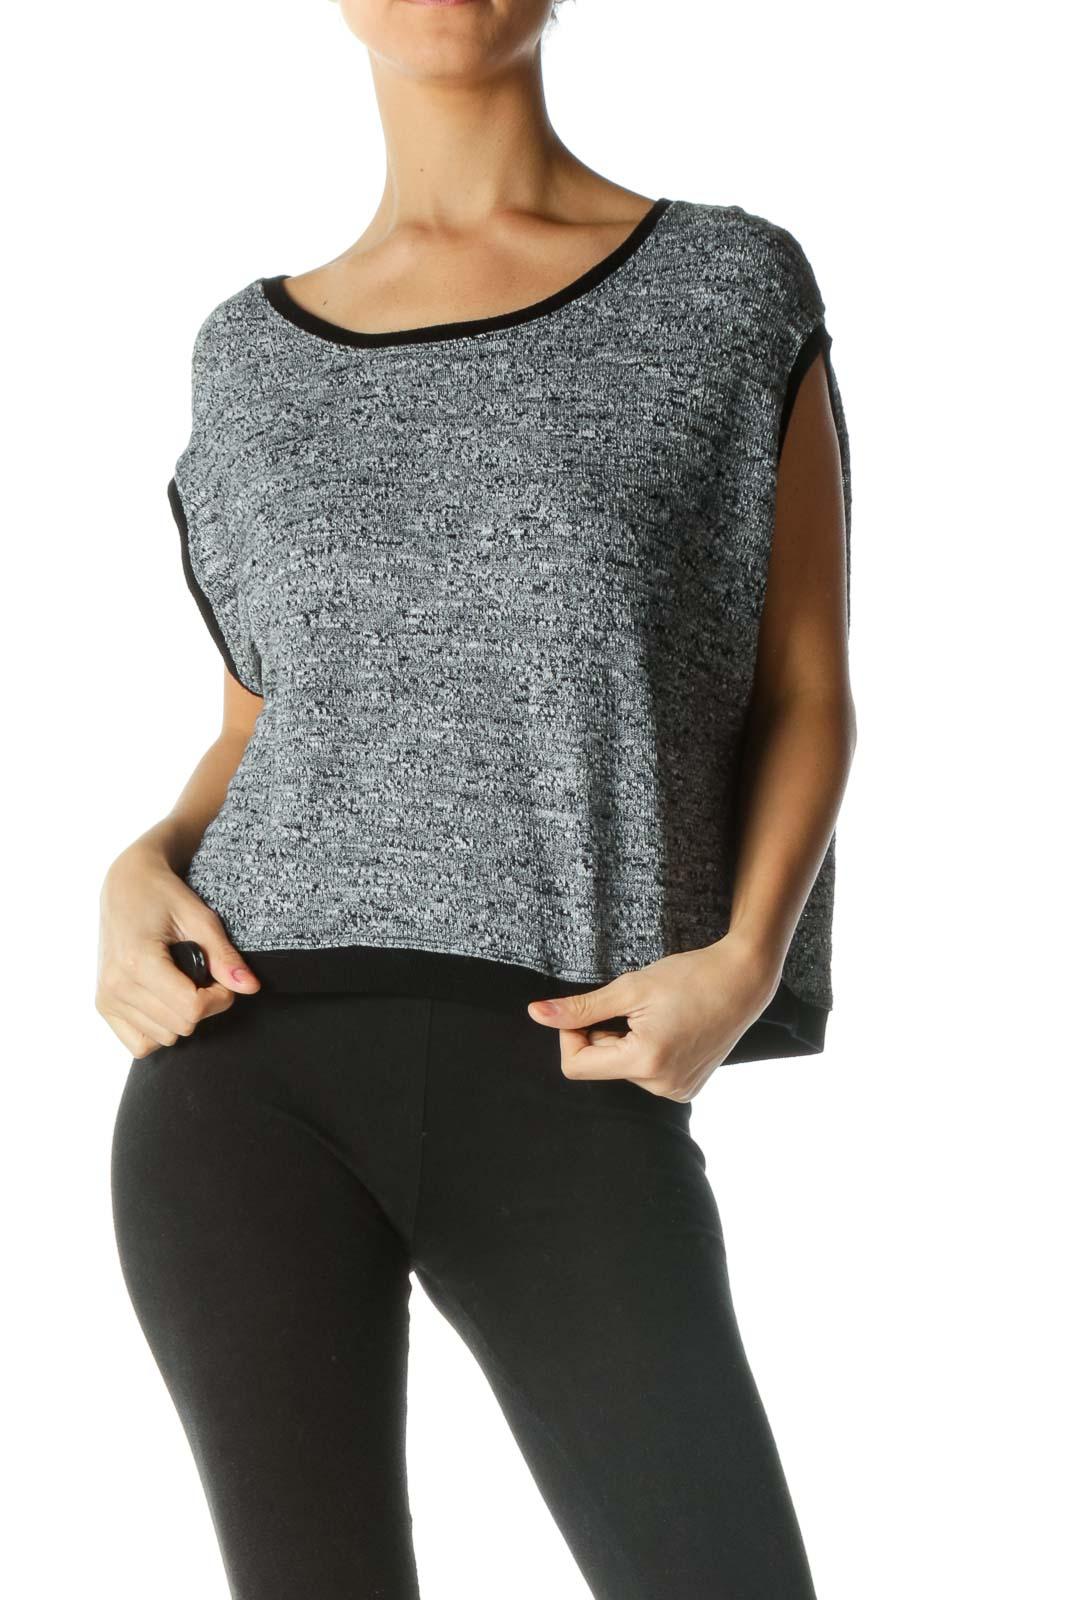 Gray Black Knit Sleeveless Top Front